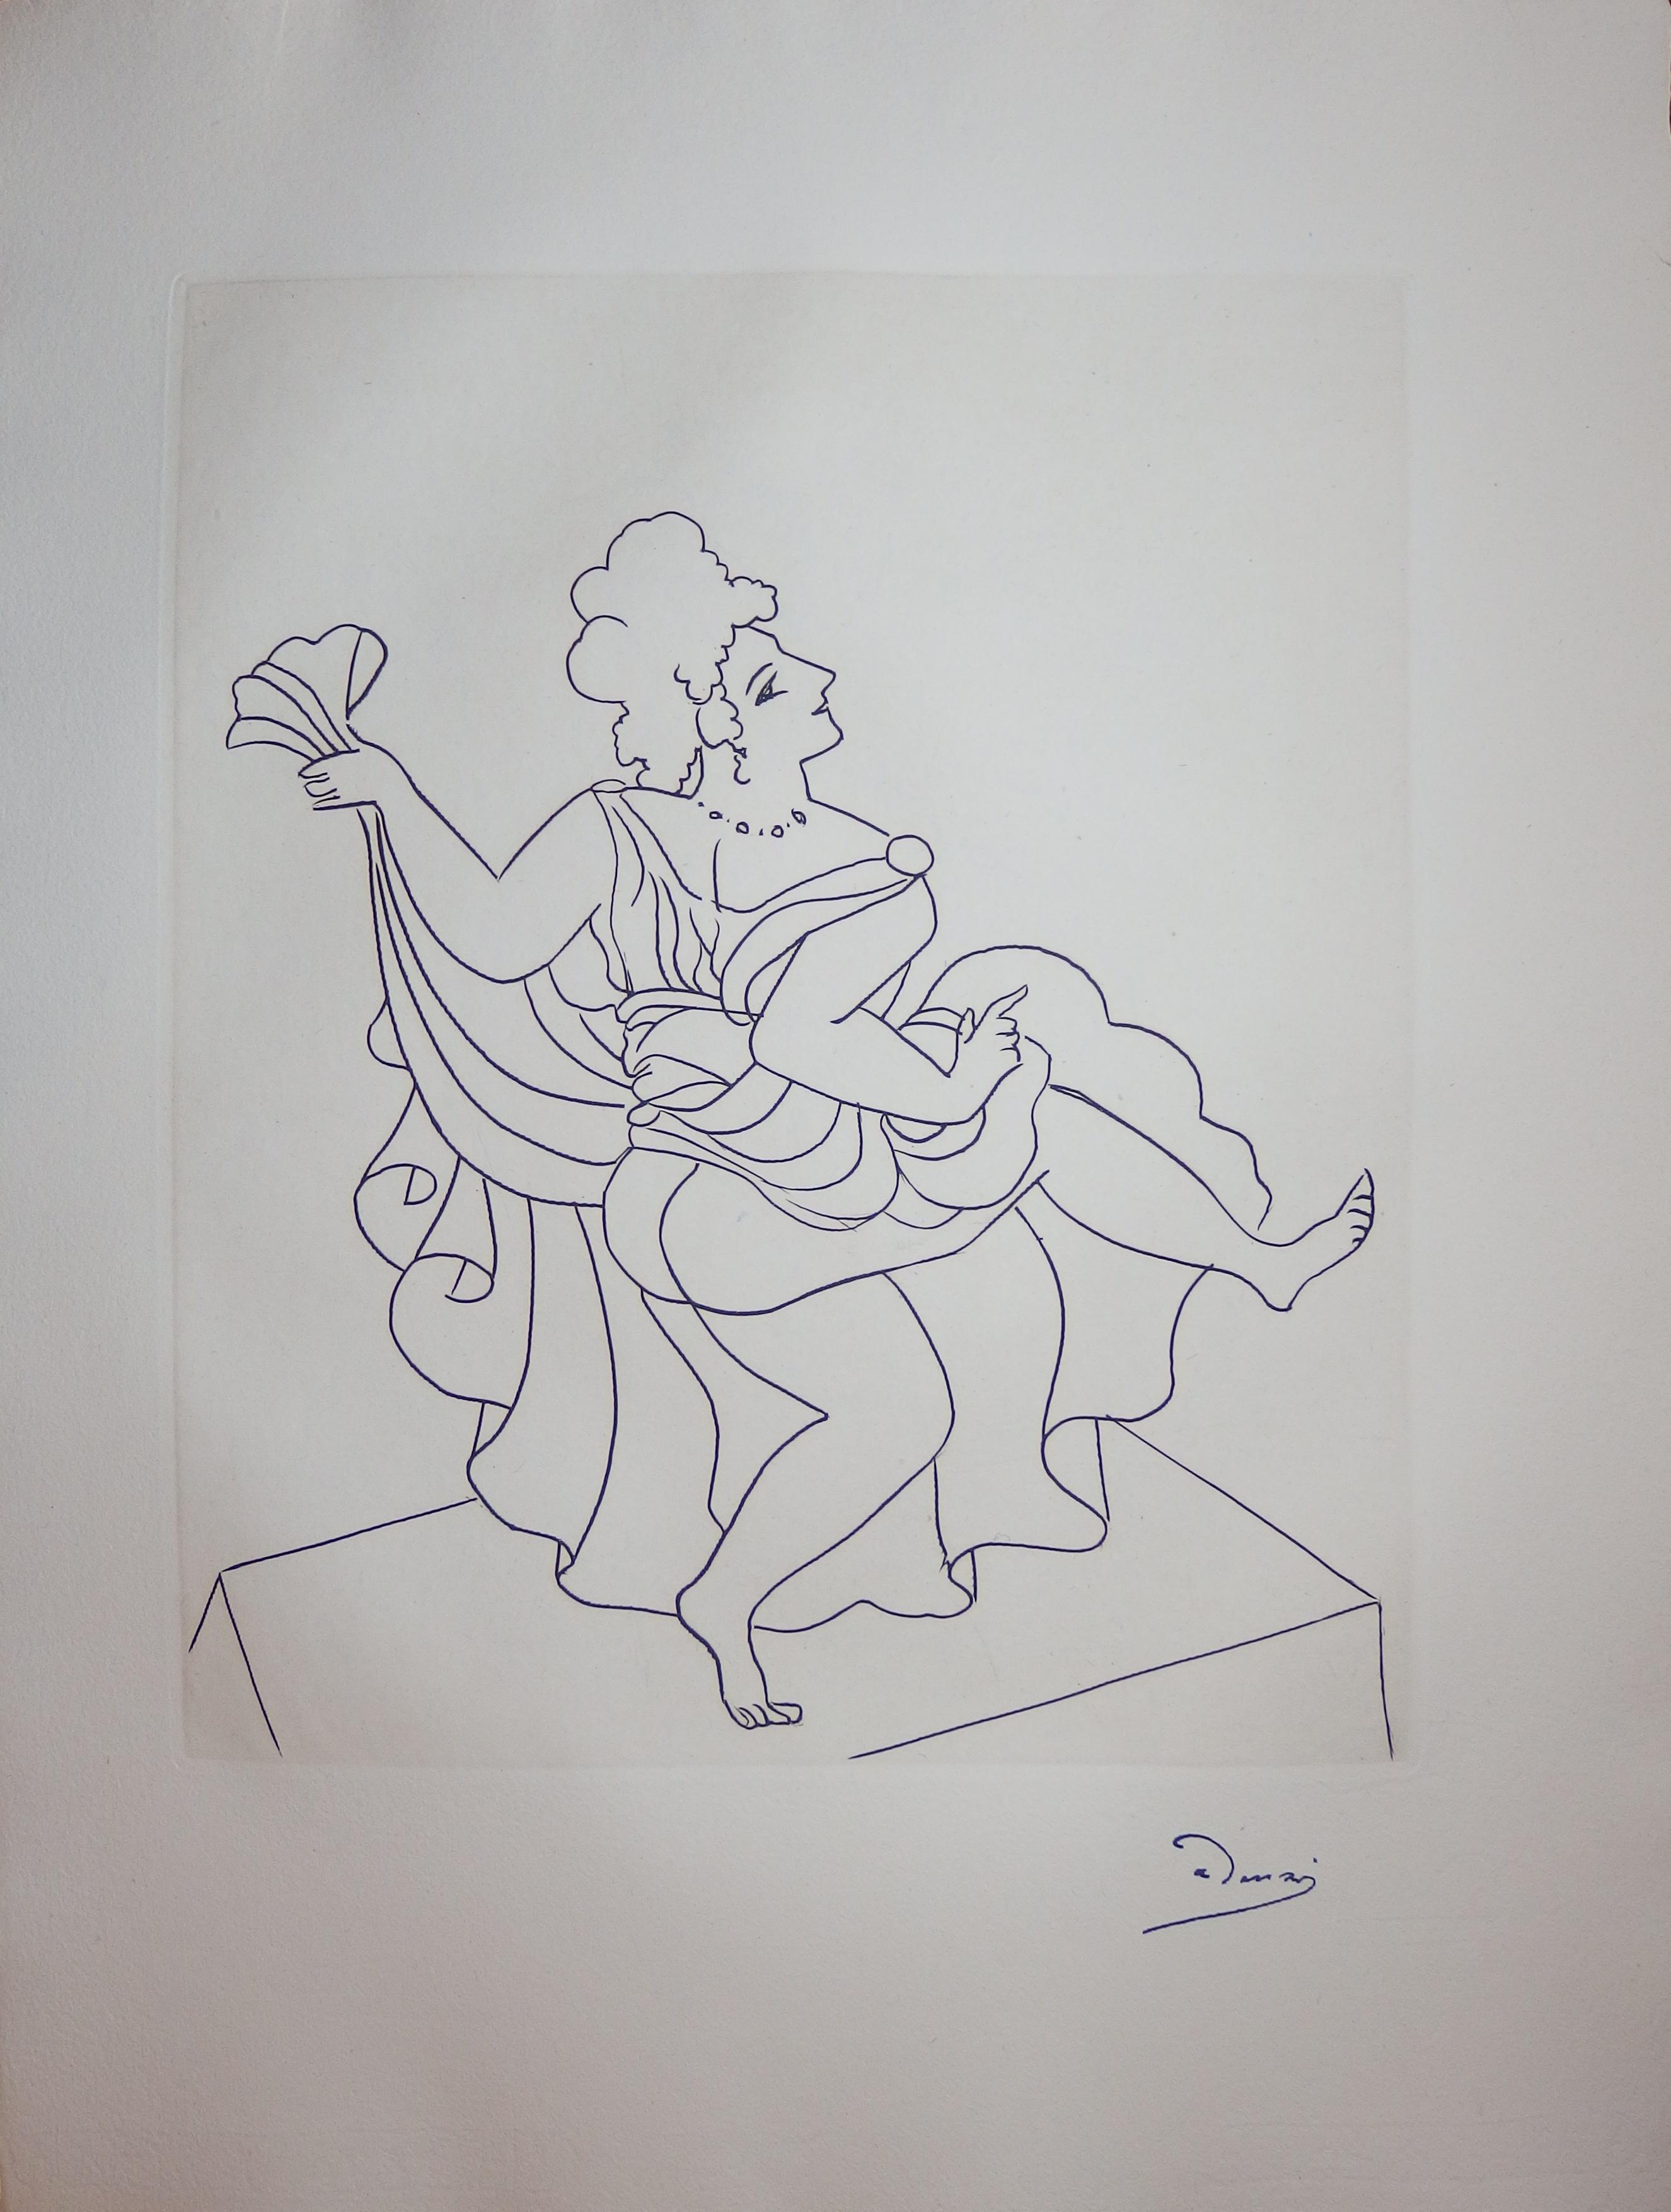 Seductive Dancer - Original etching - 1951